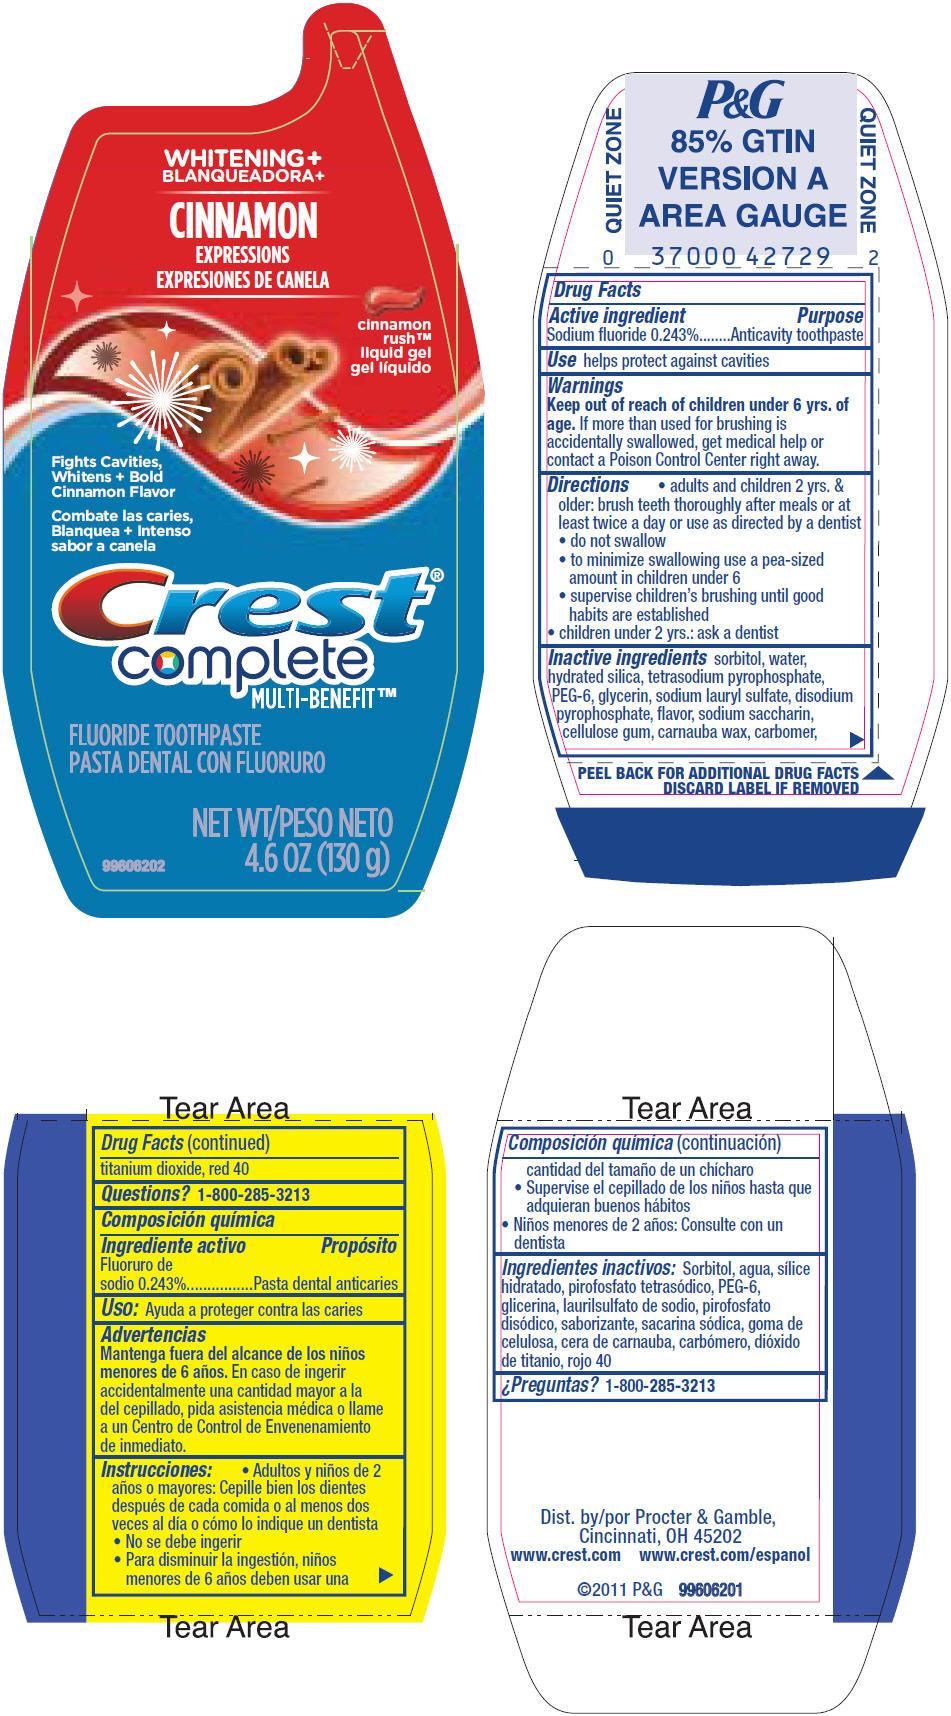 Crest Complete Multi-benefit Whitening Plus Cinnamon Expressions (Sodium Fluoride) Gel, Dentifrice [Procter & Gamble Manufacturing Company]